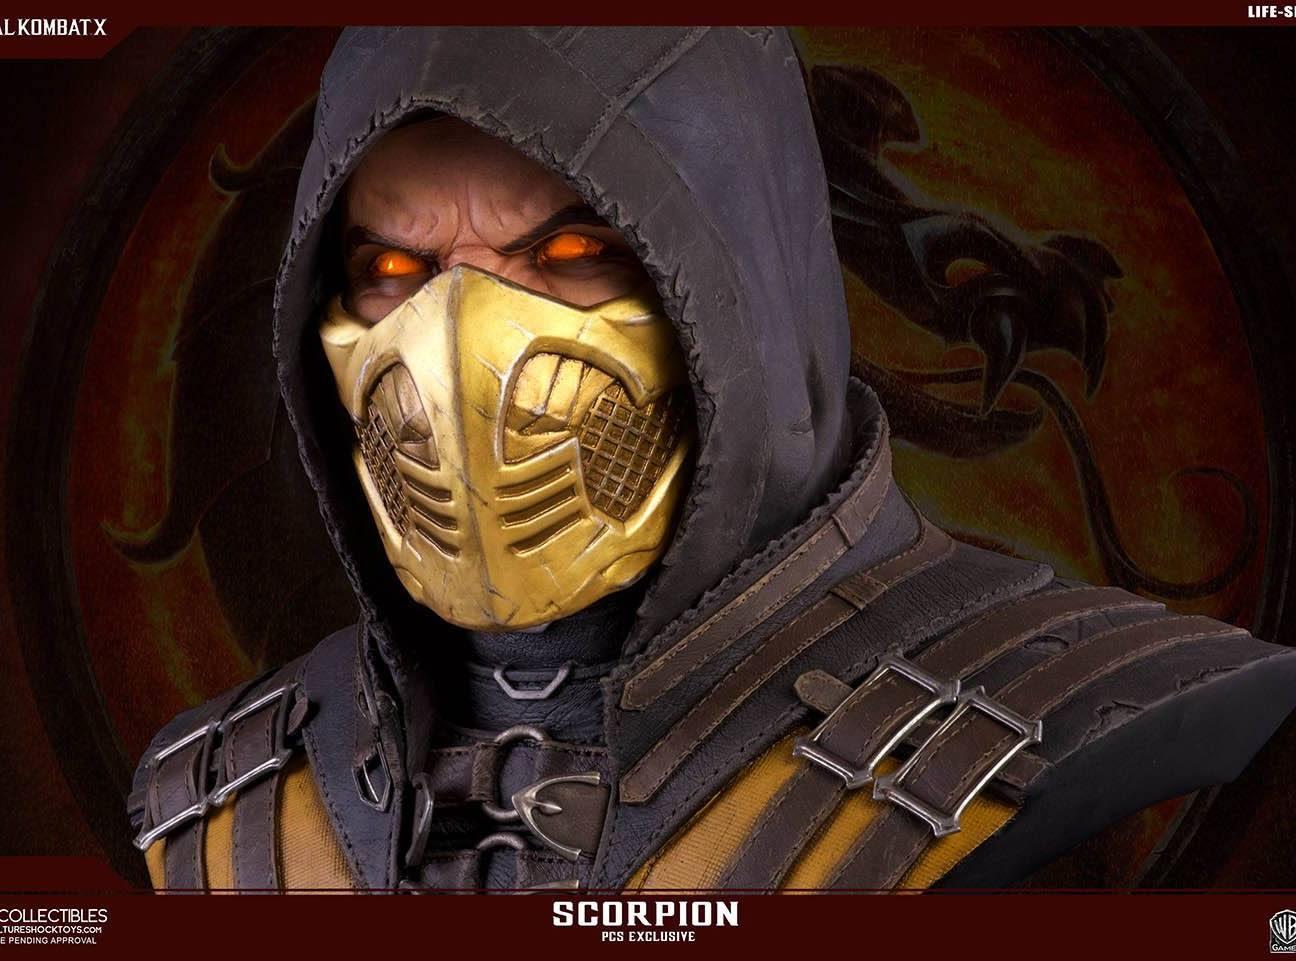 pcs-mortal-kombat-x-life-size-scorpion-bust-1